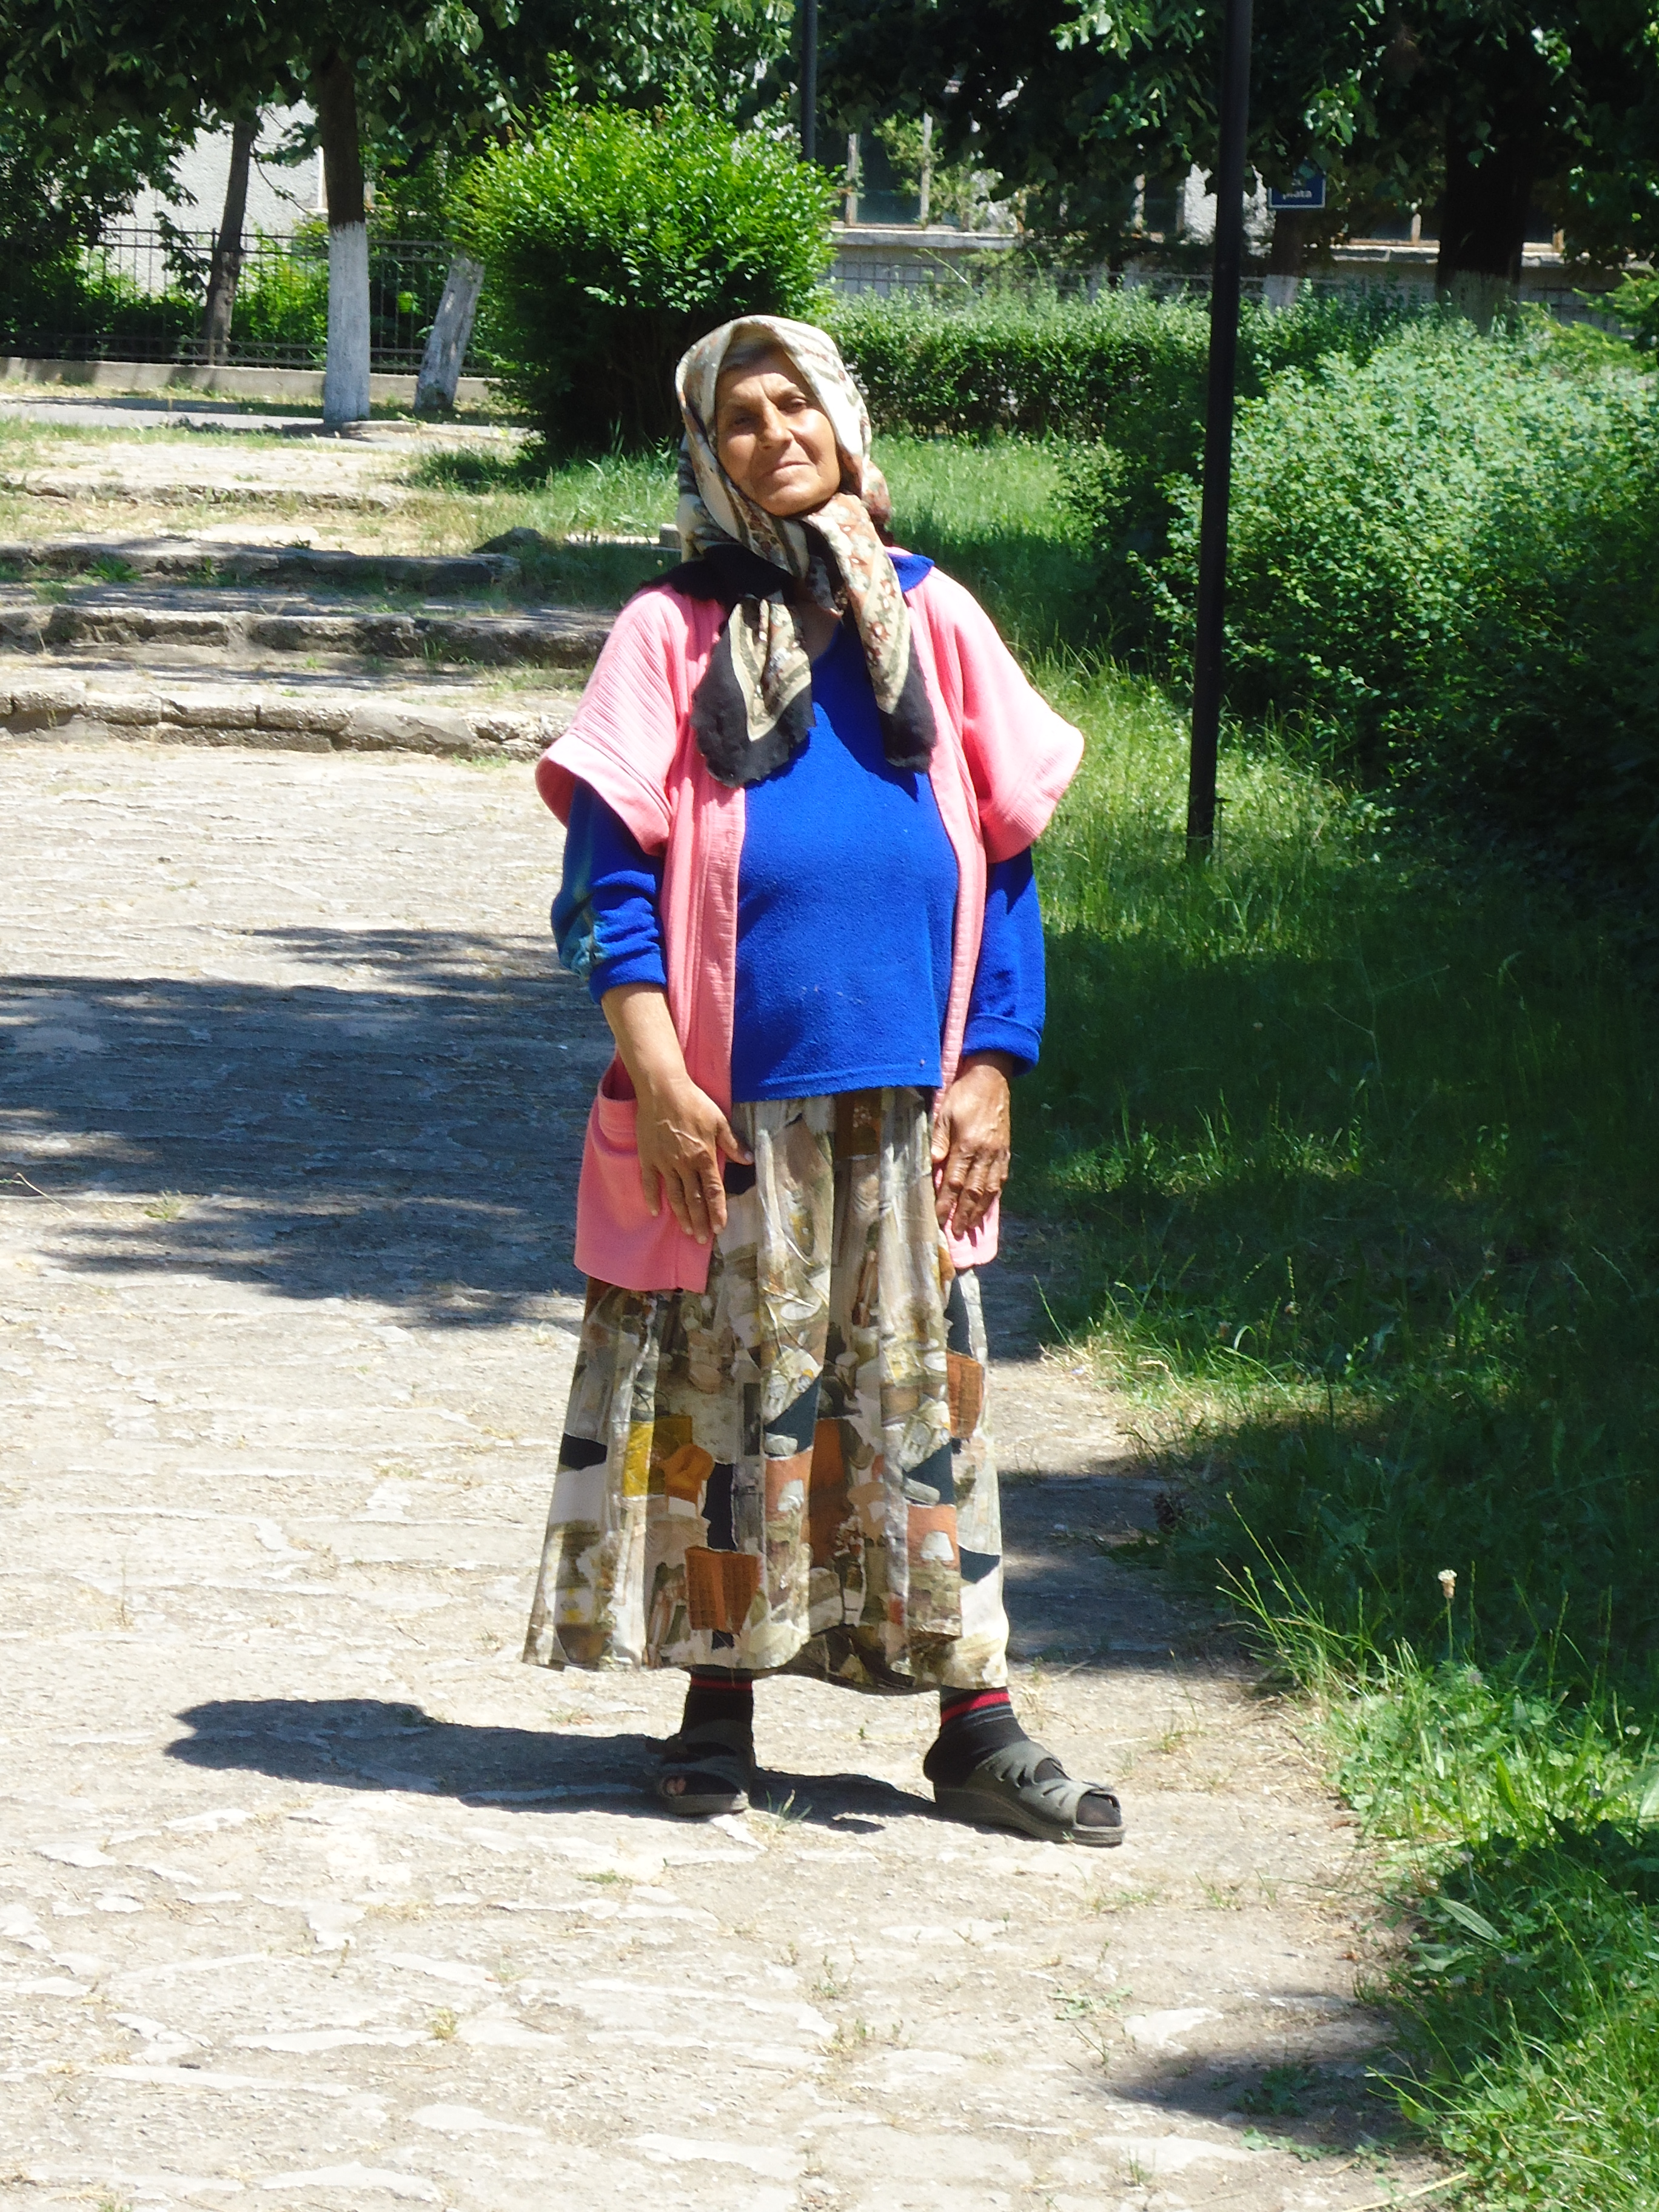 Gypsies Clothing For Men